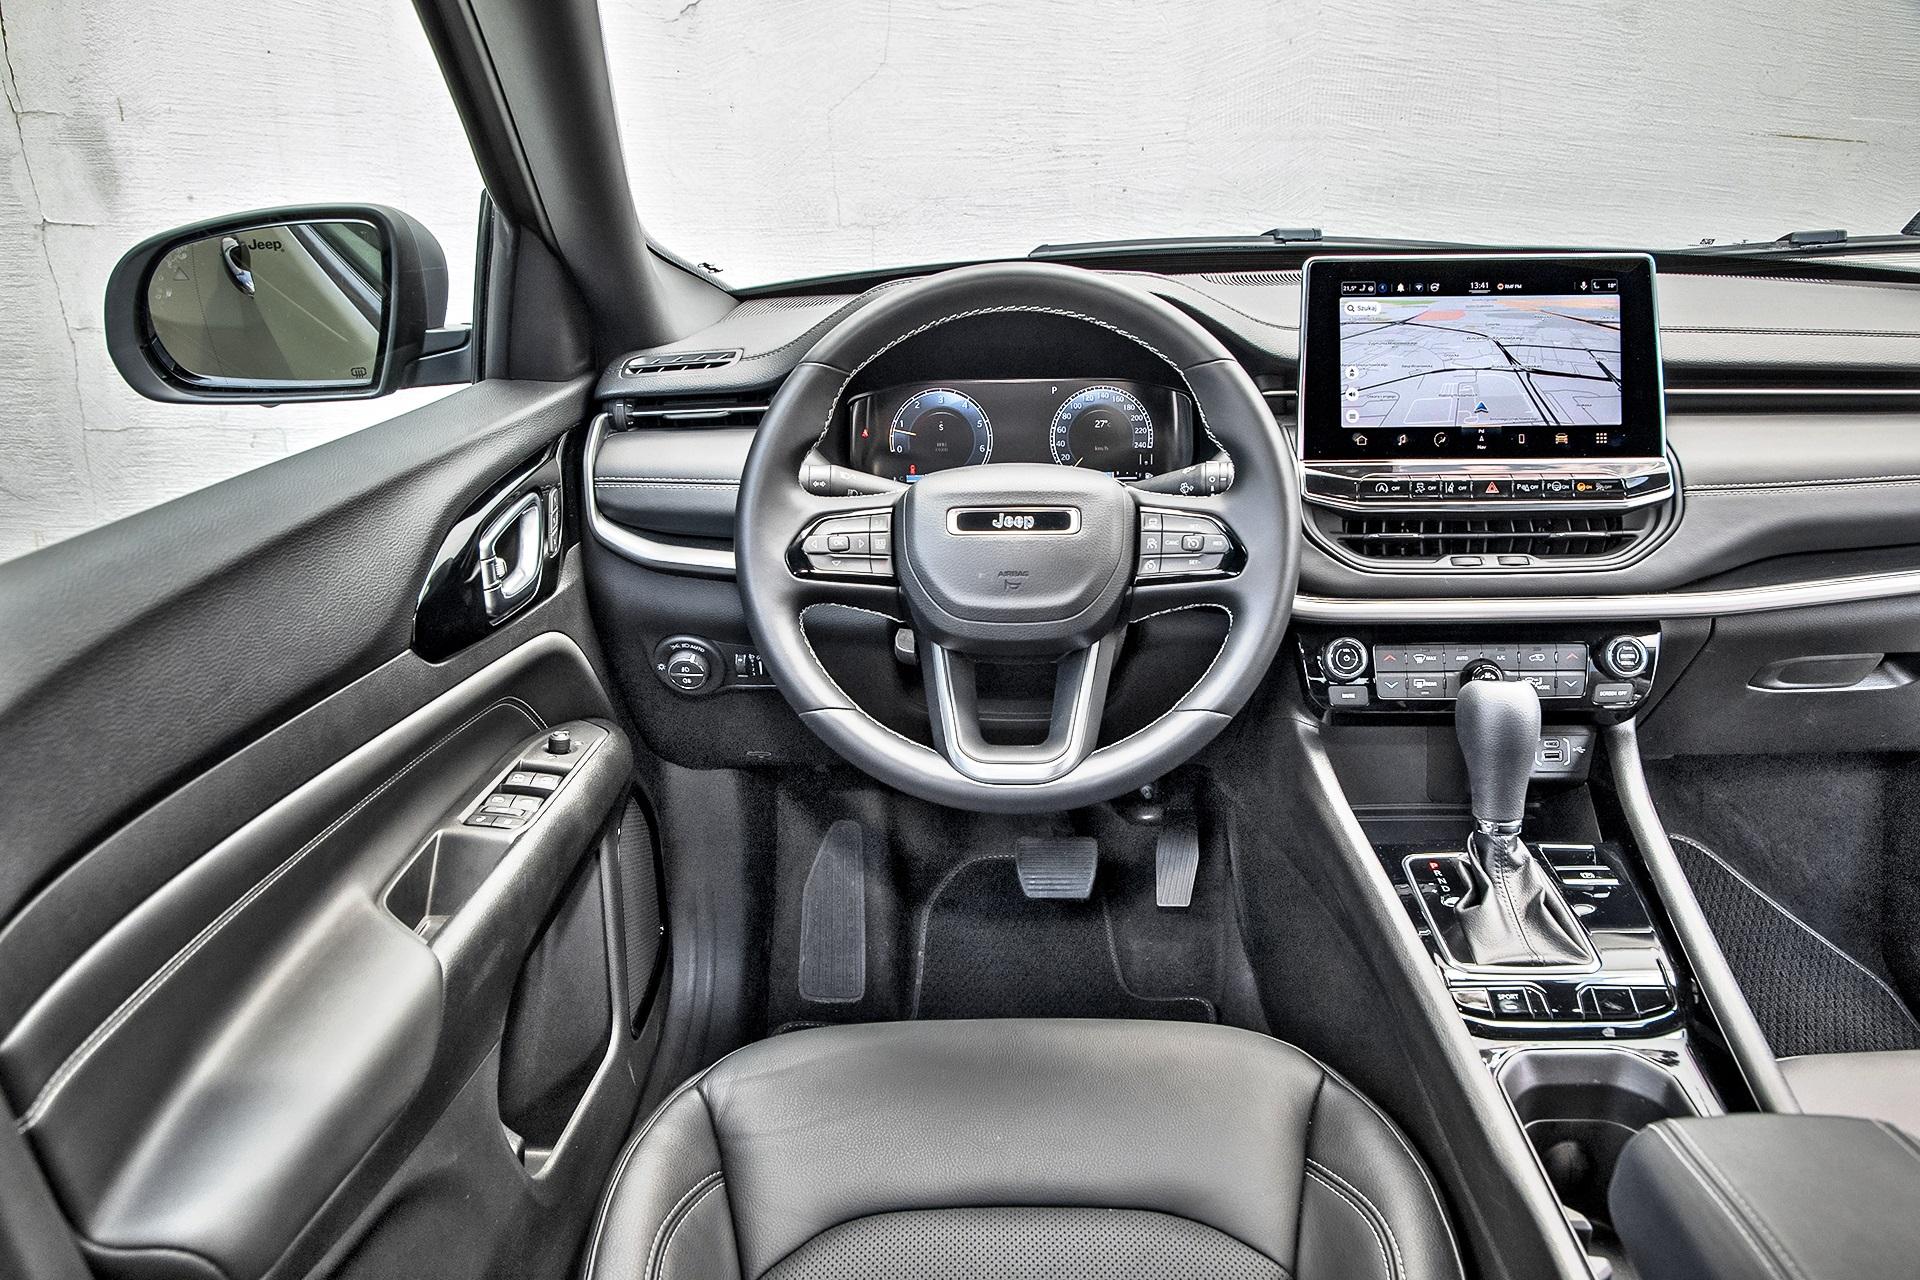 2021 Jeep Compass 1.3 GSE Turbo - kokpit